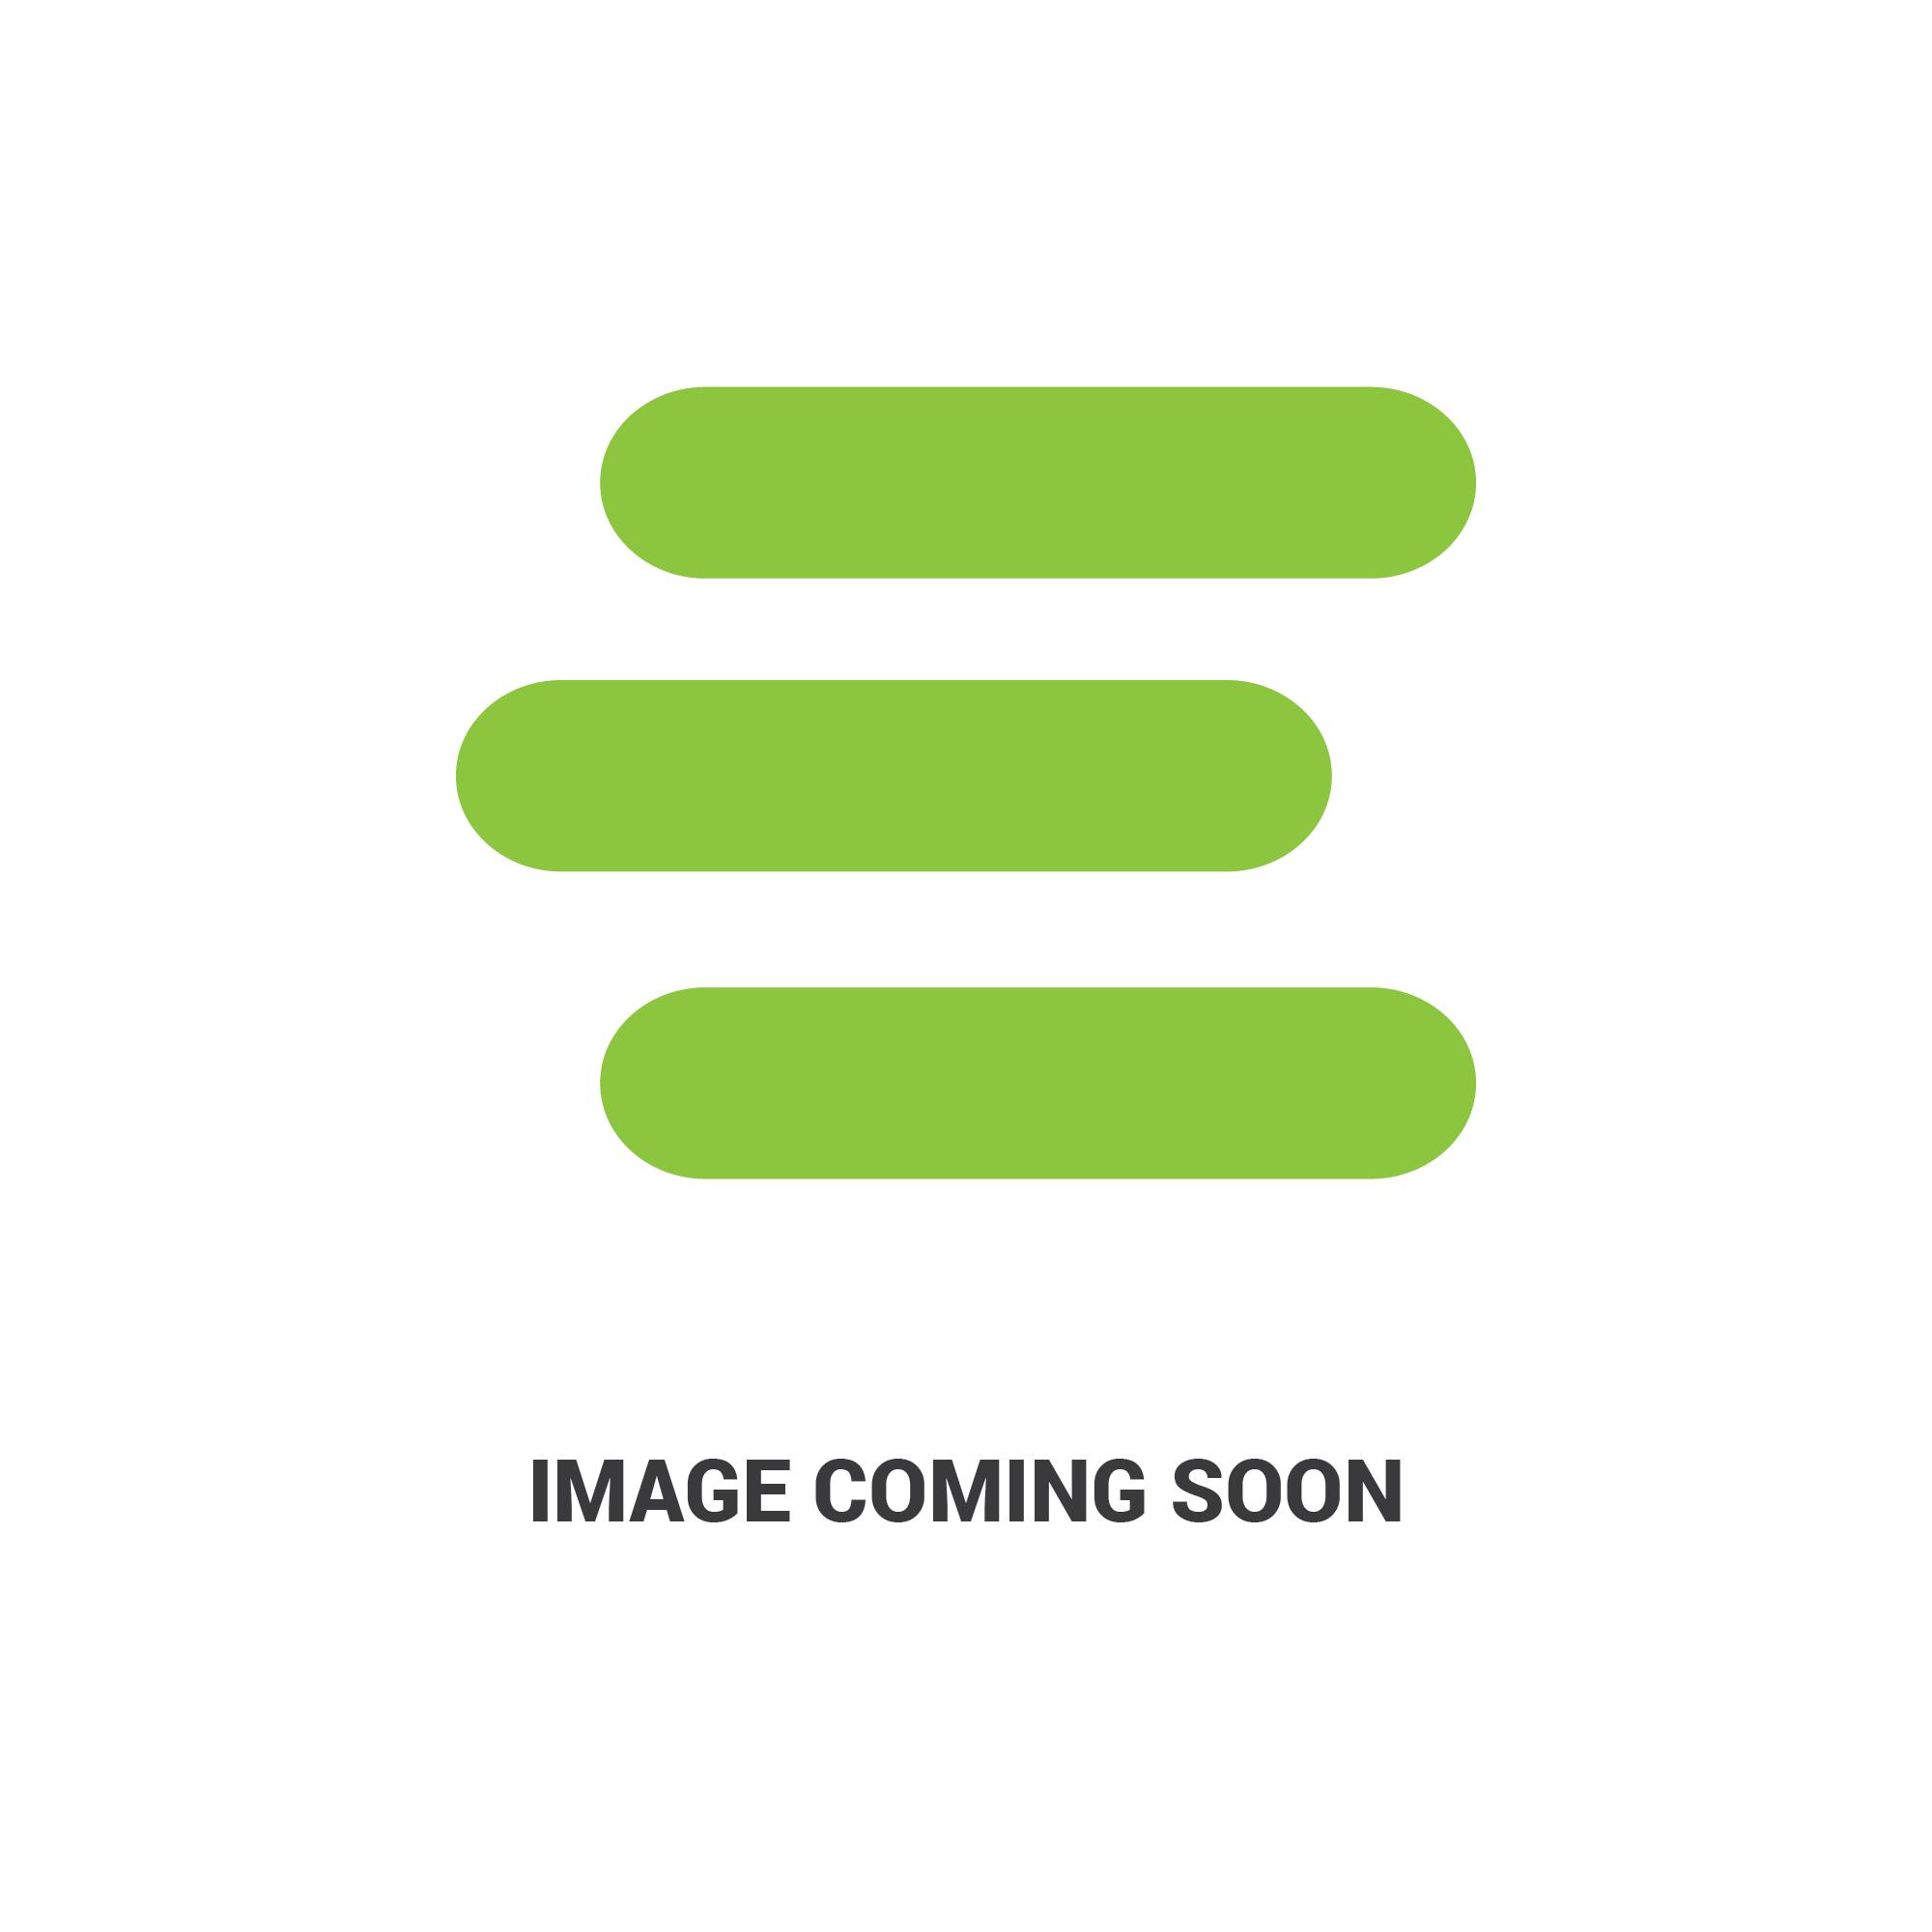 E-70000-152411968_1.jpg